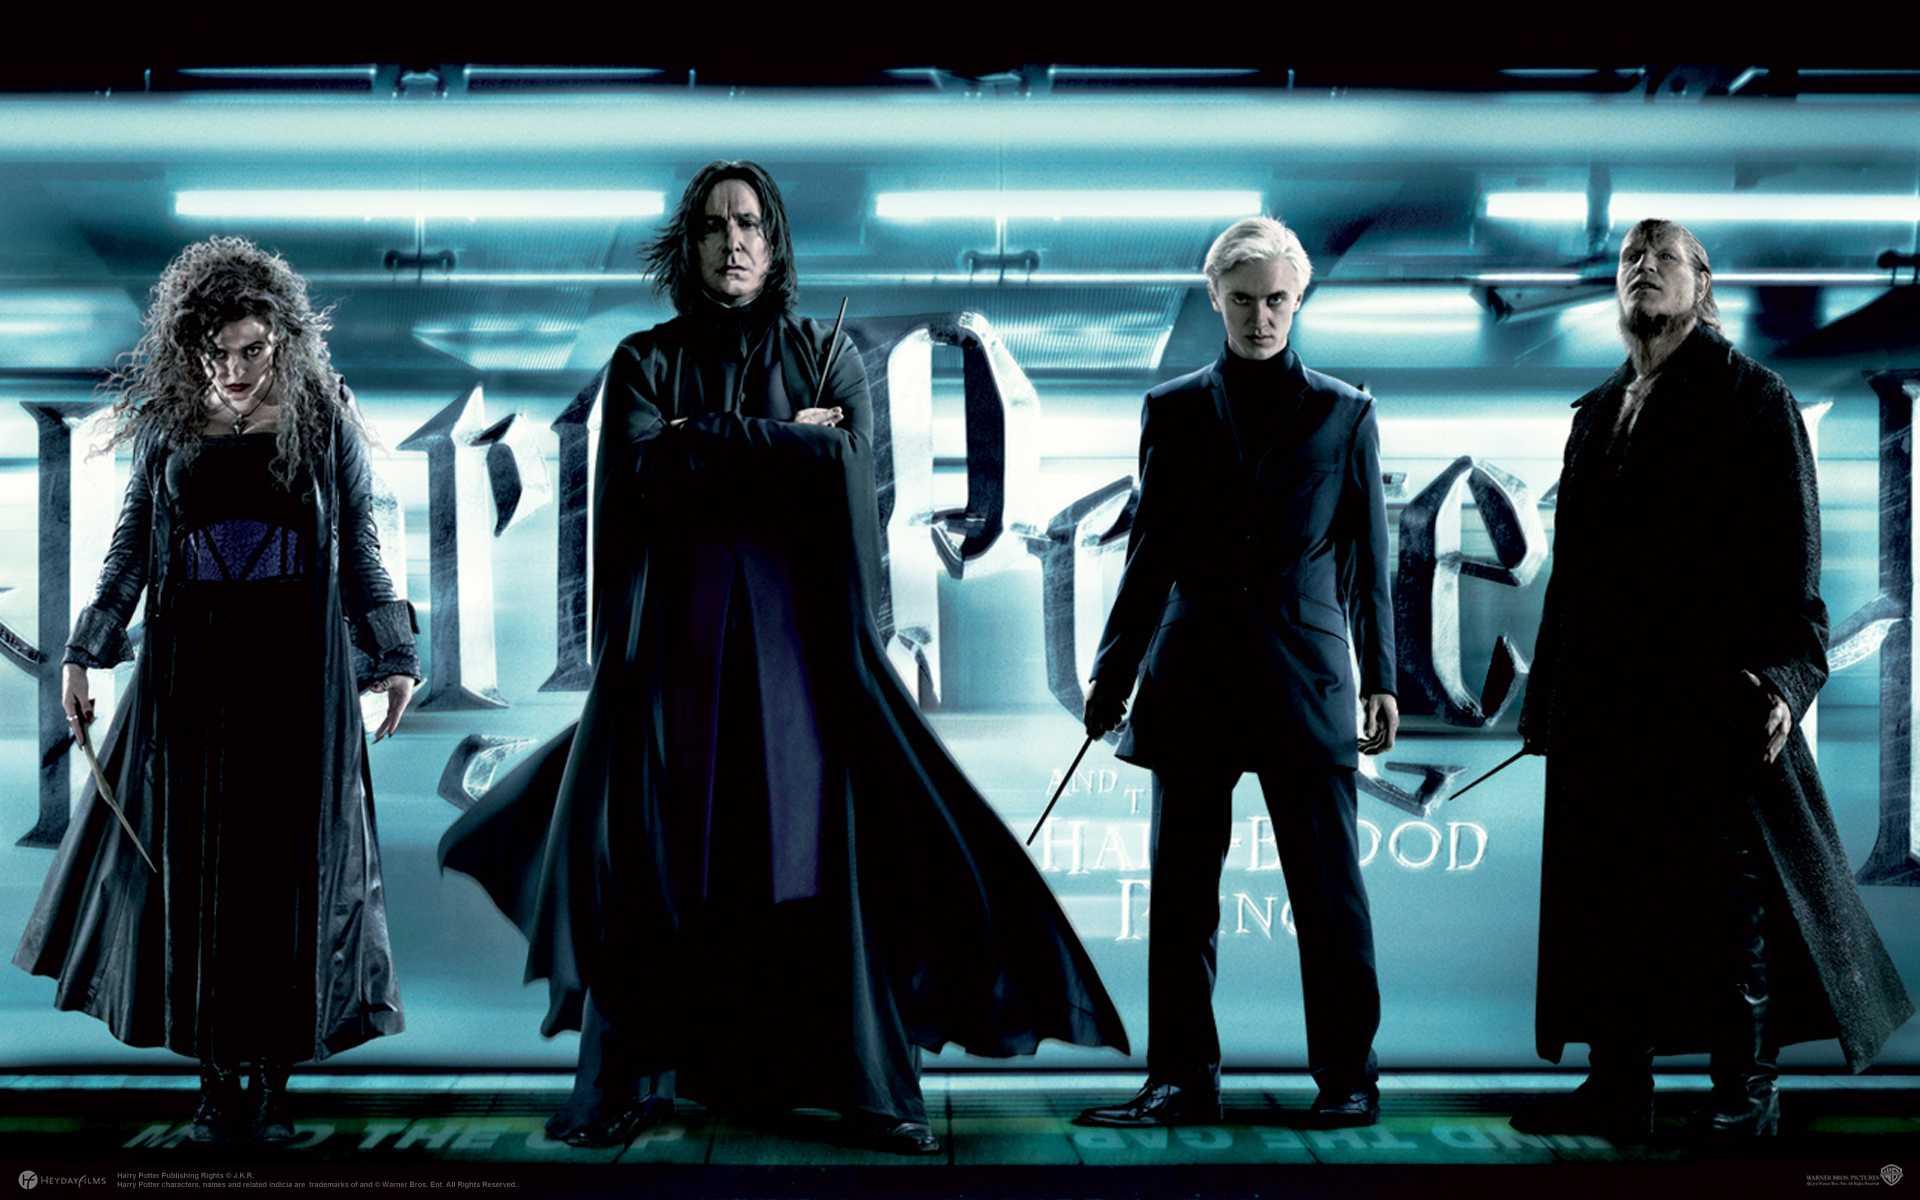 Harry Potter i Książe Półkrwi na DVD (edycja dwupłytowa)